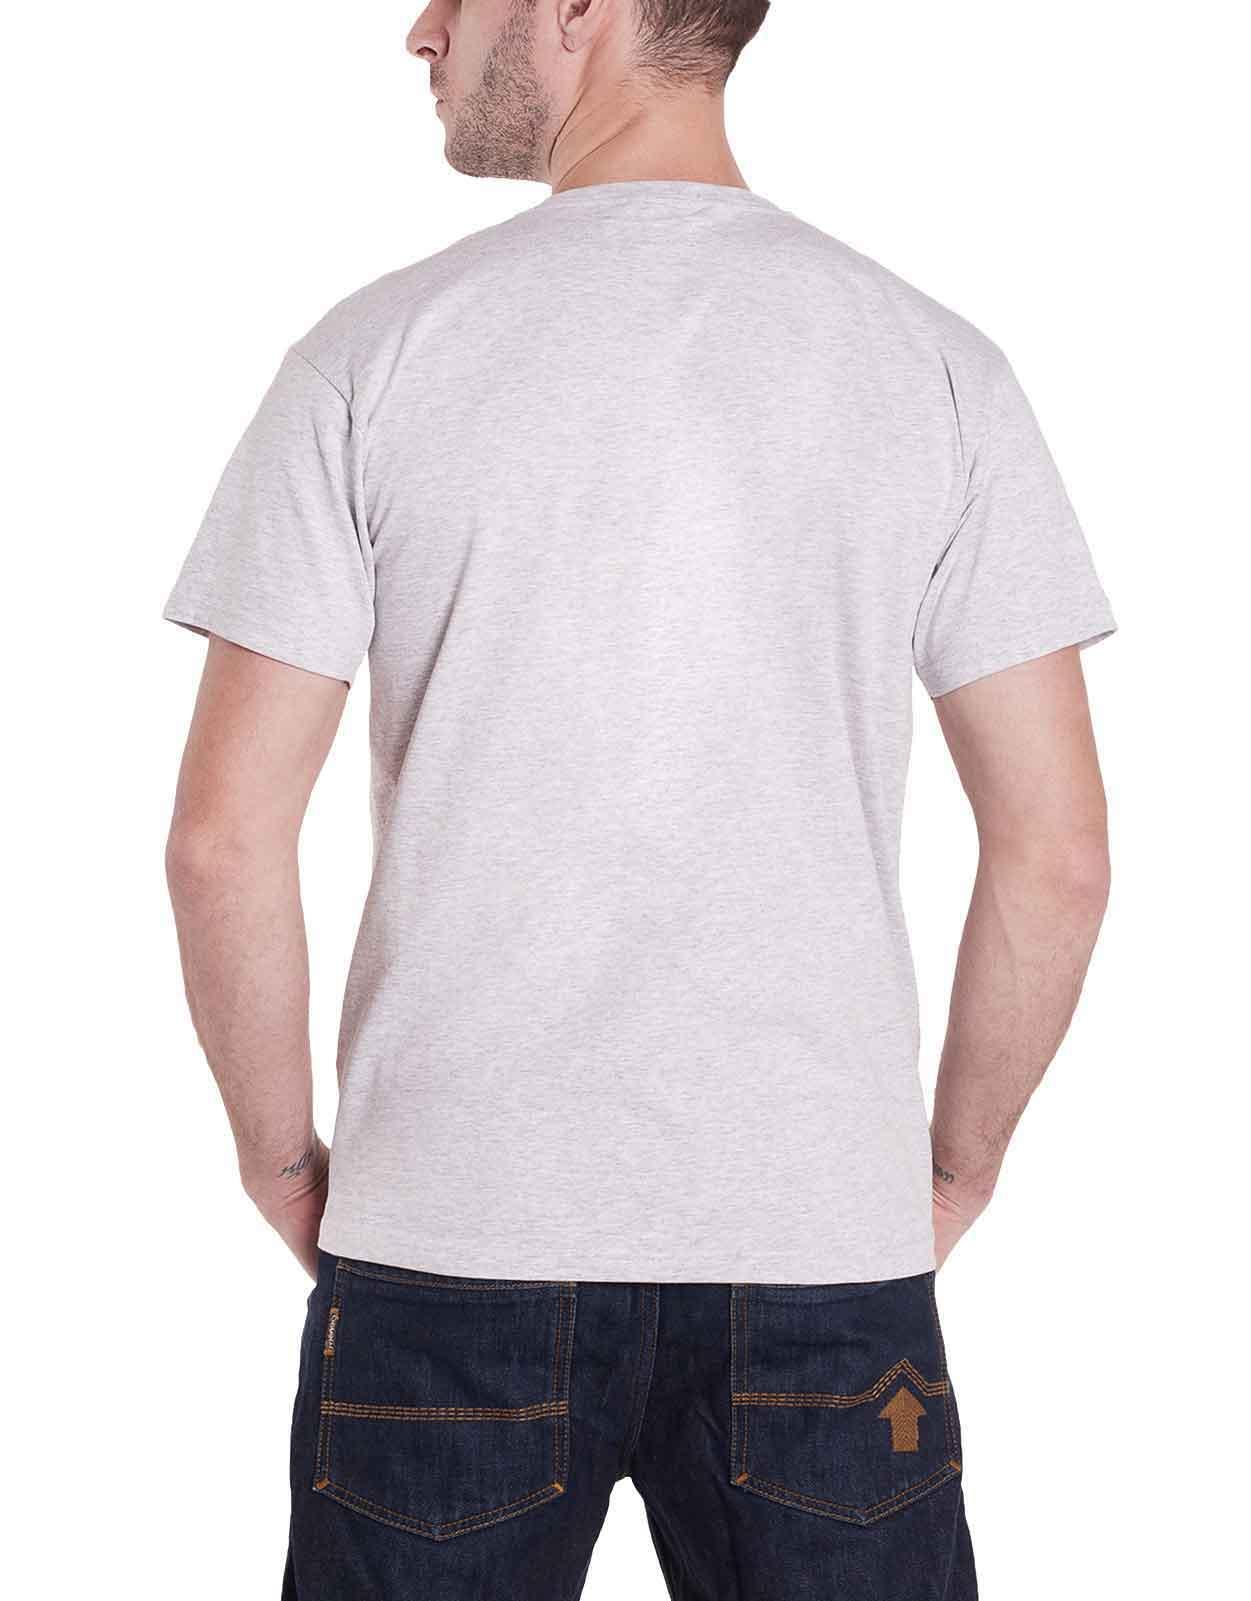 Officiel-Harry-Potter-T-Shirt-Poudlard-Gryffondor-Poufsouffle-cretes-Homme-NEUF miniature 49